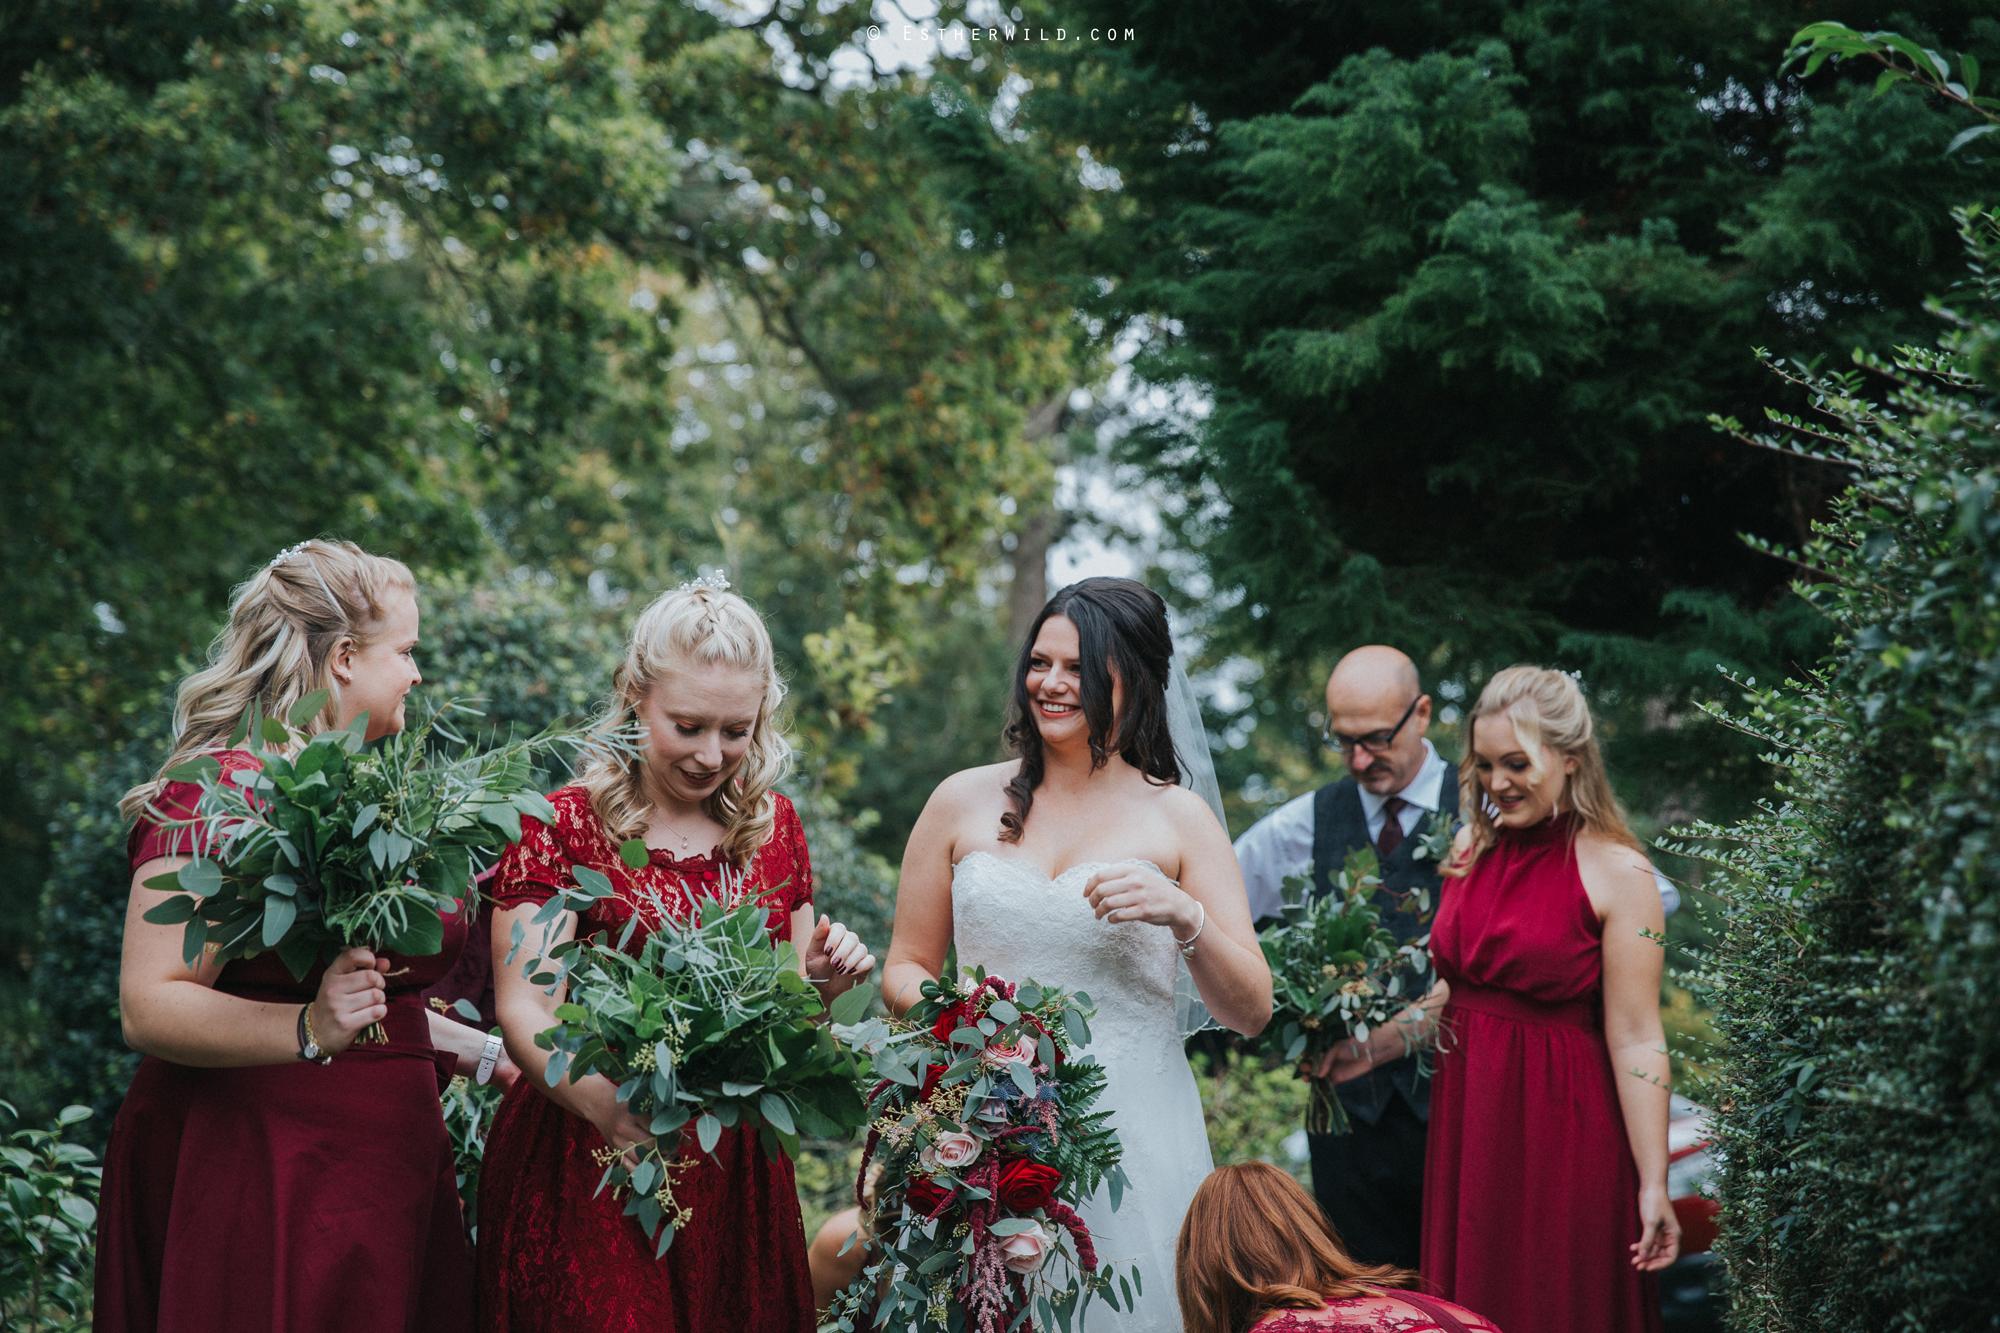 Reading_Room_Weddings_Alby_Norwich_Photographer_Esther_Wild_IMG_0802.jpg